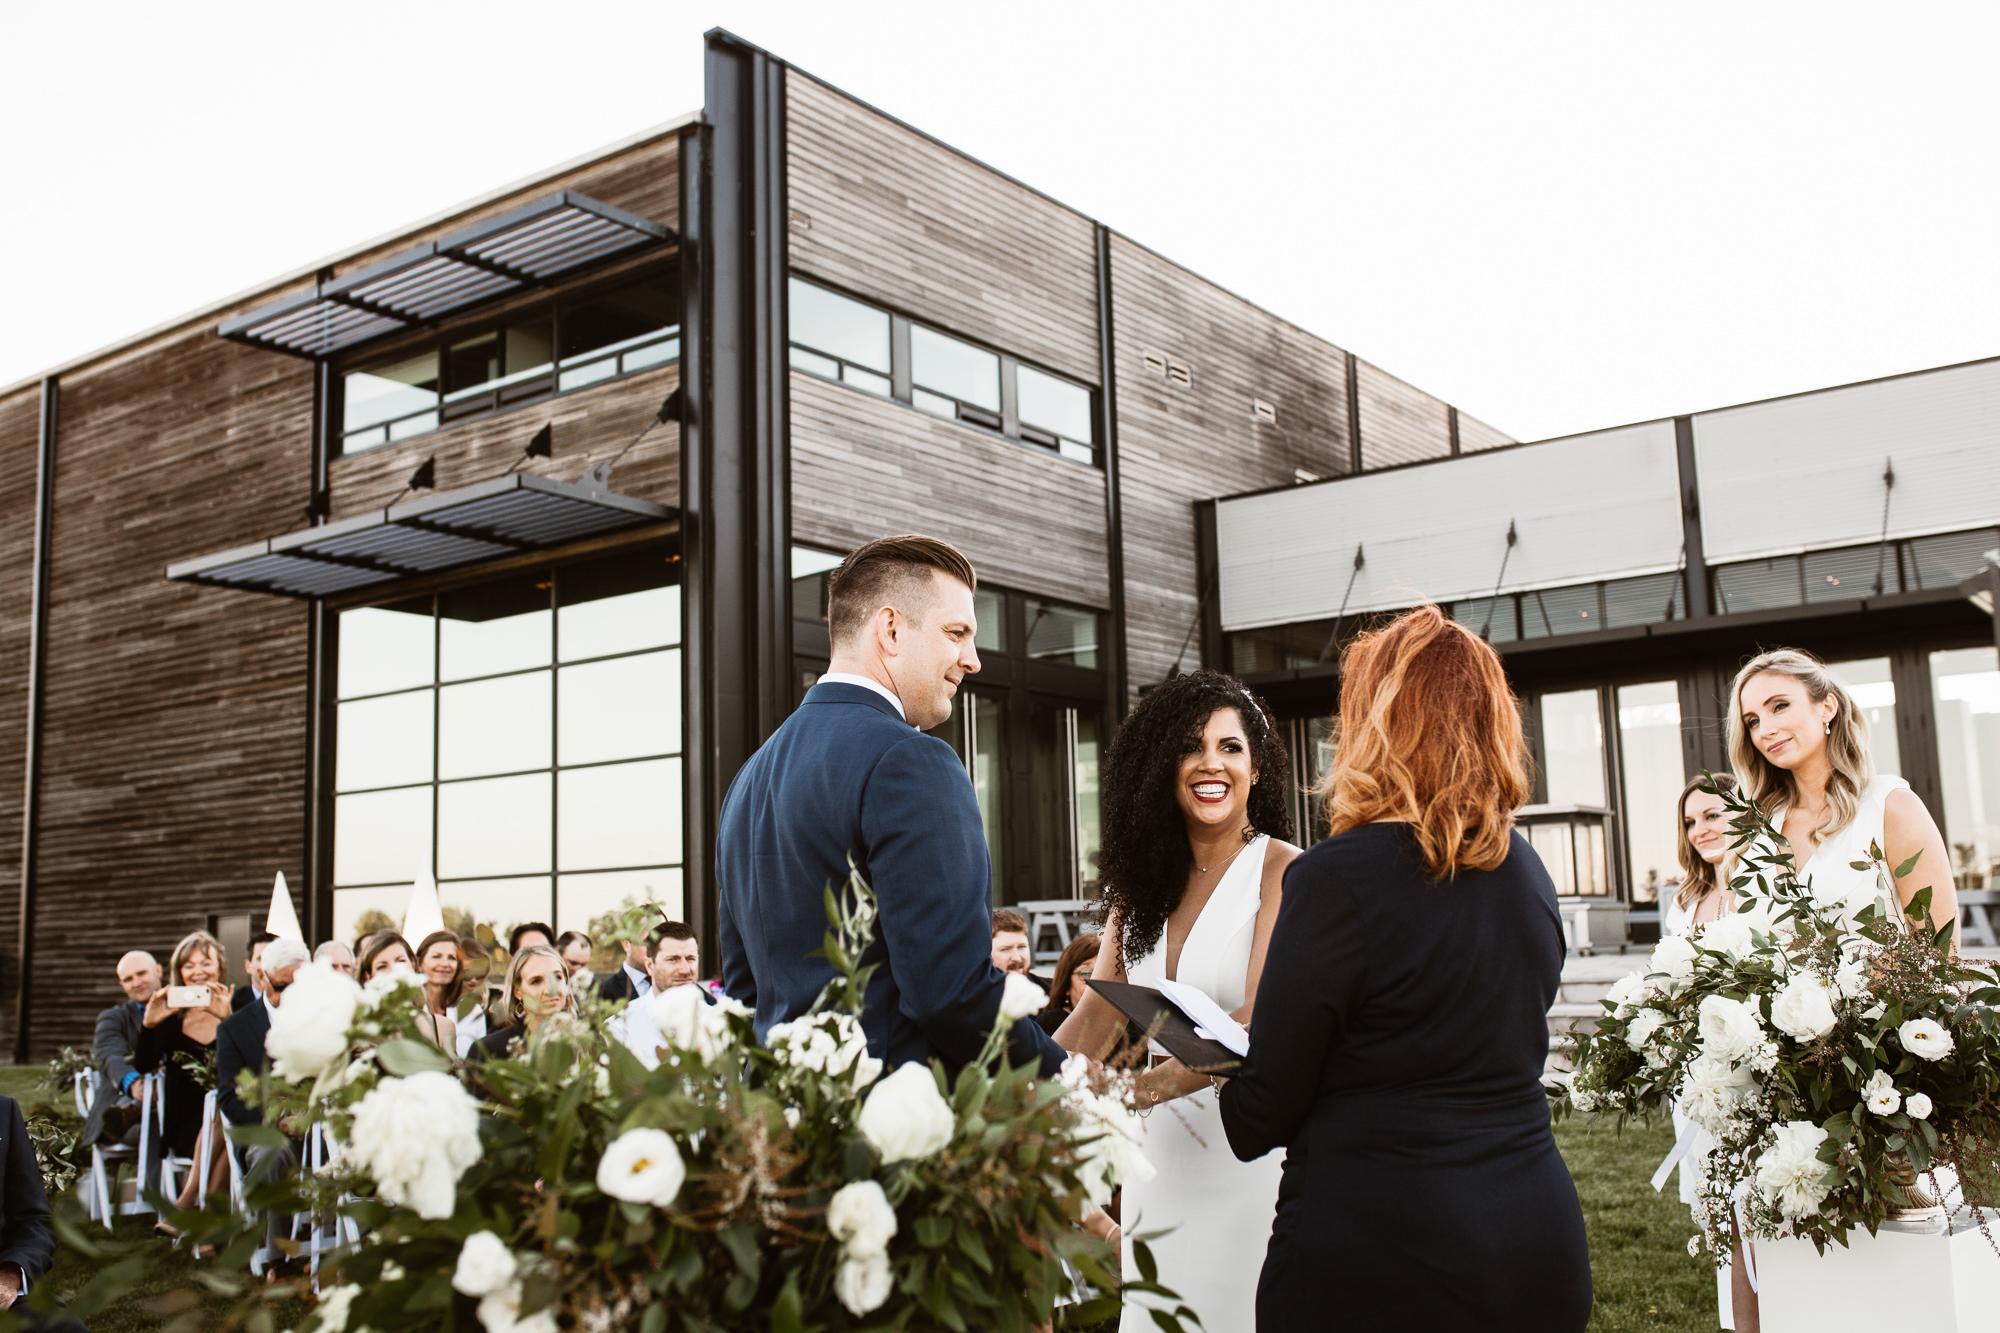 stratus-winery-wedding-vineyard-wedding-vineyard-bride-photo-by-reed-photography-042.jpg